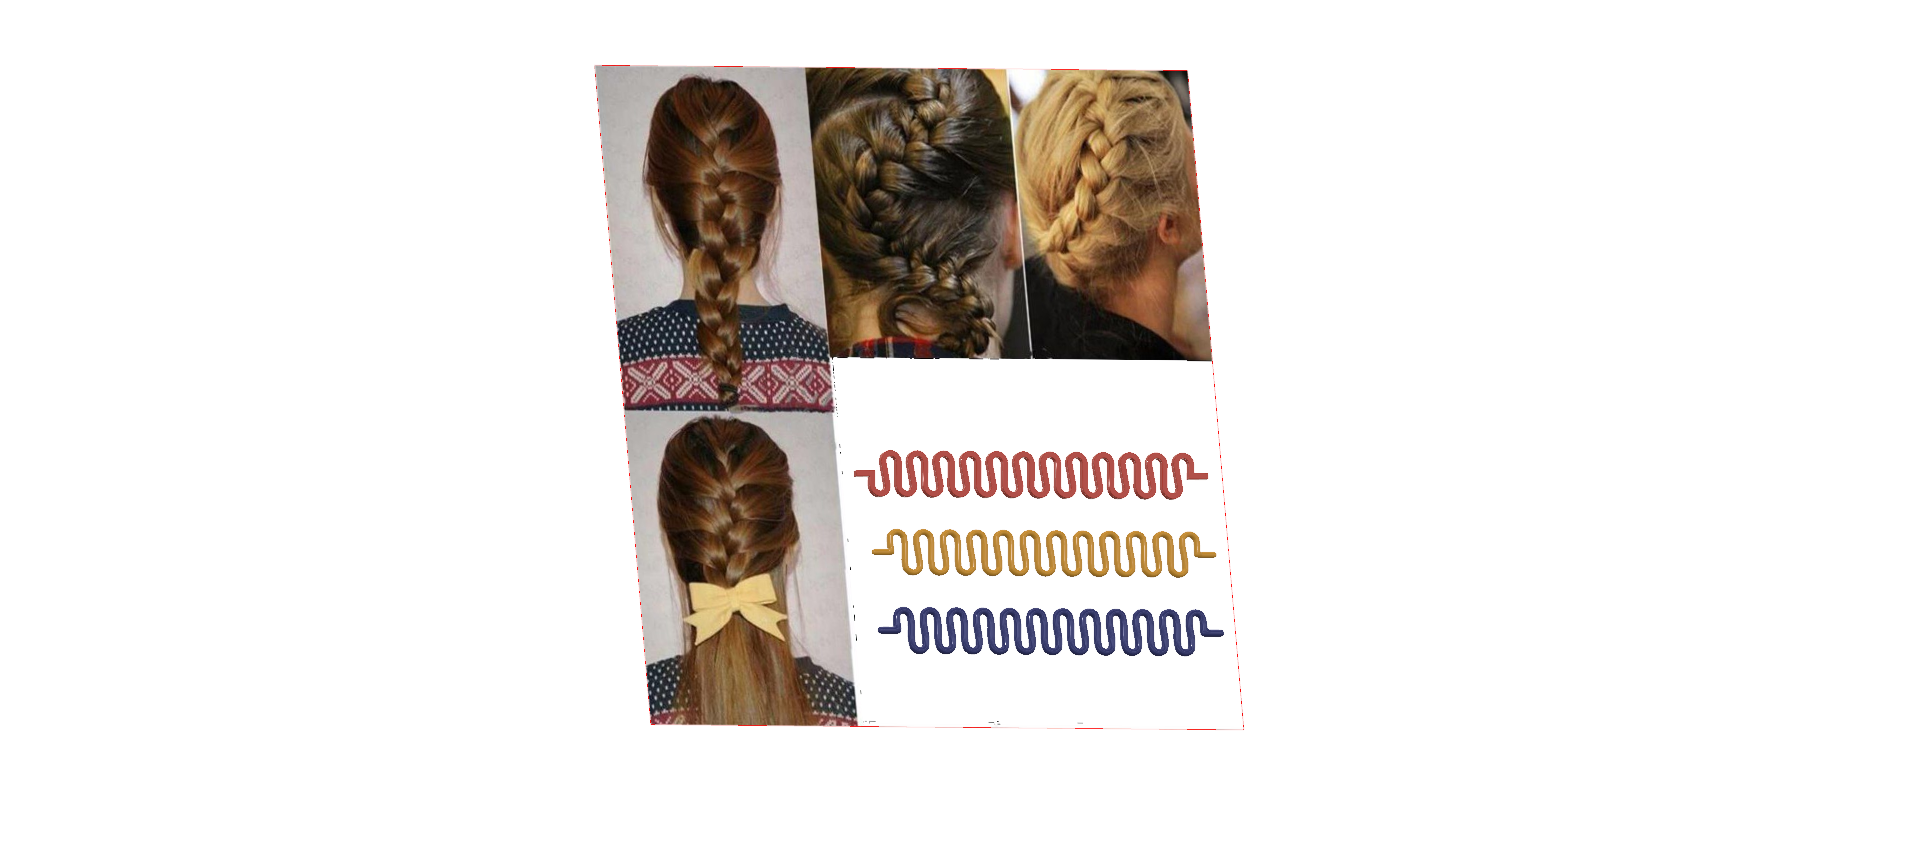 Female braid hair 04 v5-02.png Download STL file female hair braid hair styling roller hair accessories for girl headdress weaving tool 3d print cnc • 3D printing object, Dzusto